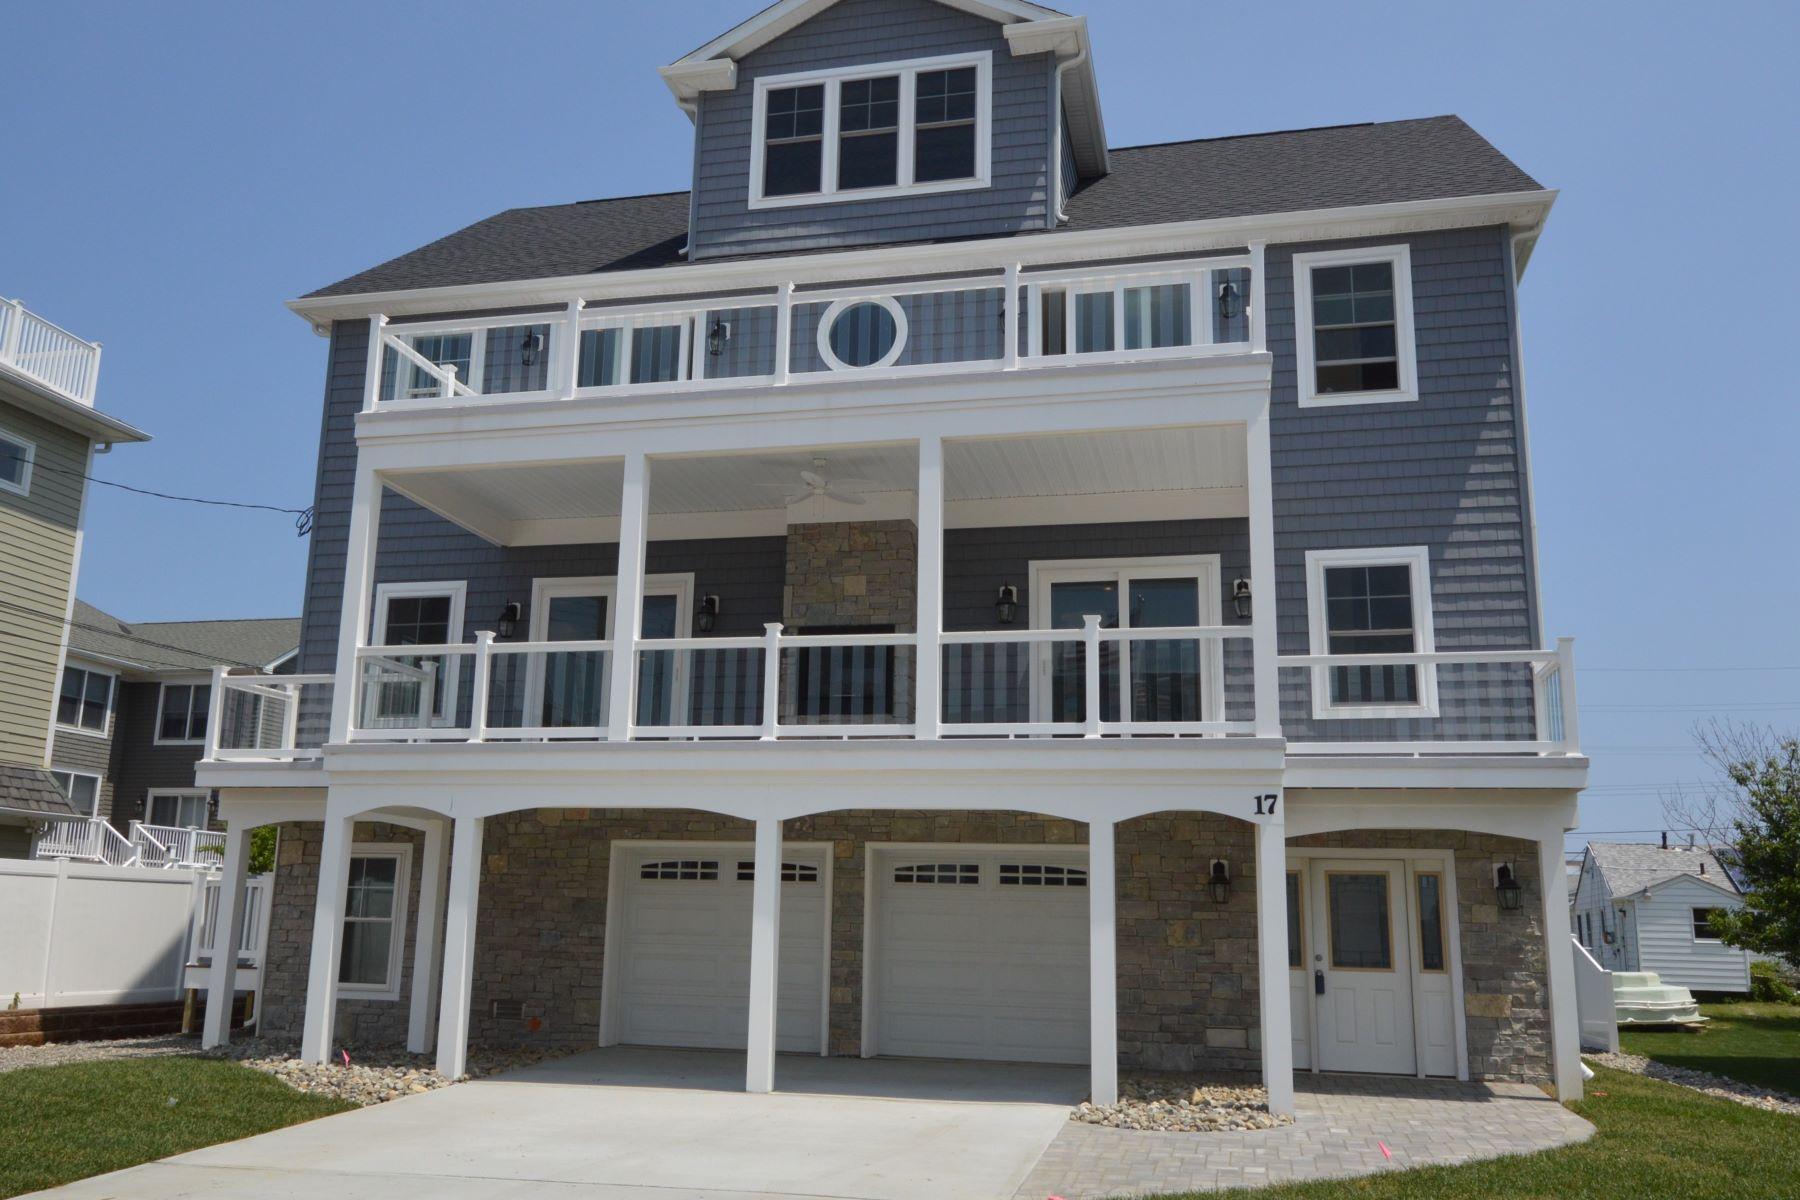 Single Family Home for Sale at Sea Bright NJ - Seashore Colonial 17 Longview Way Sea Bright, New Jersey 07760 United States